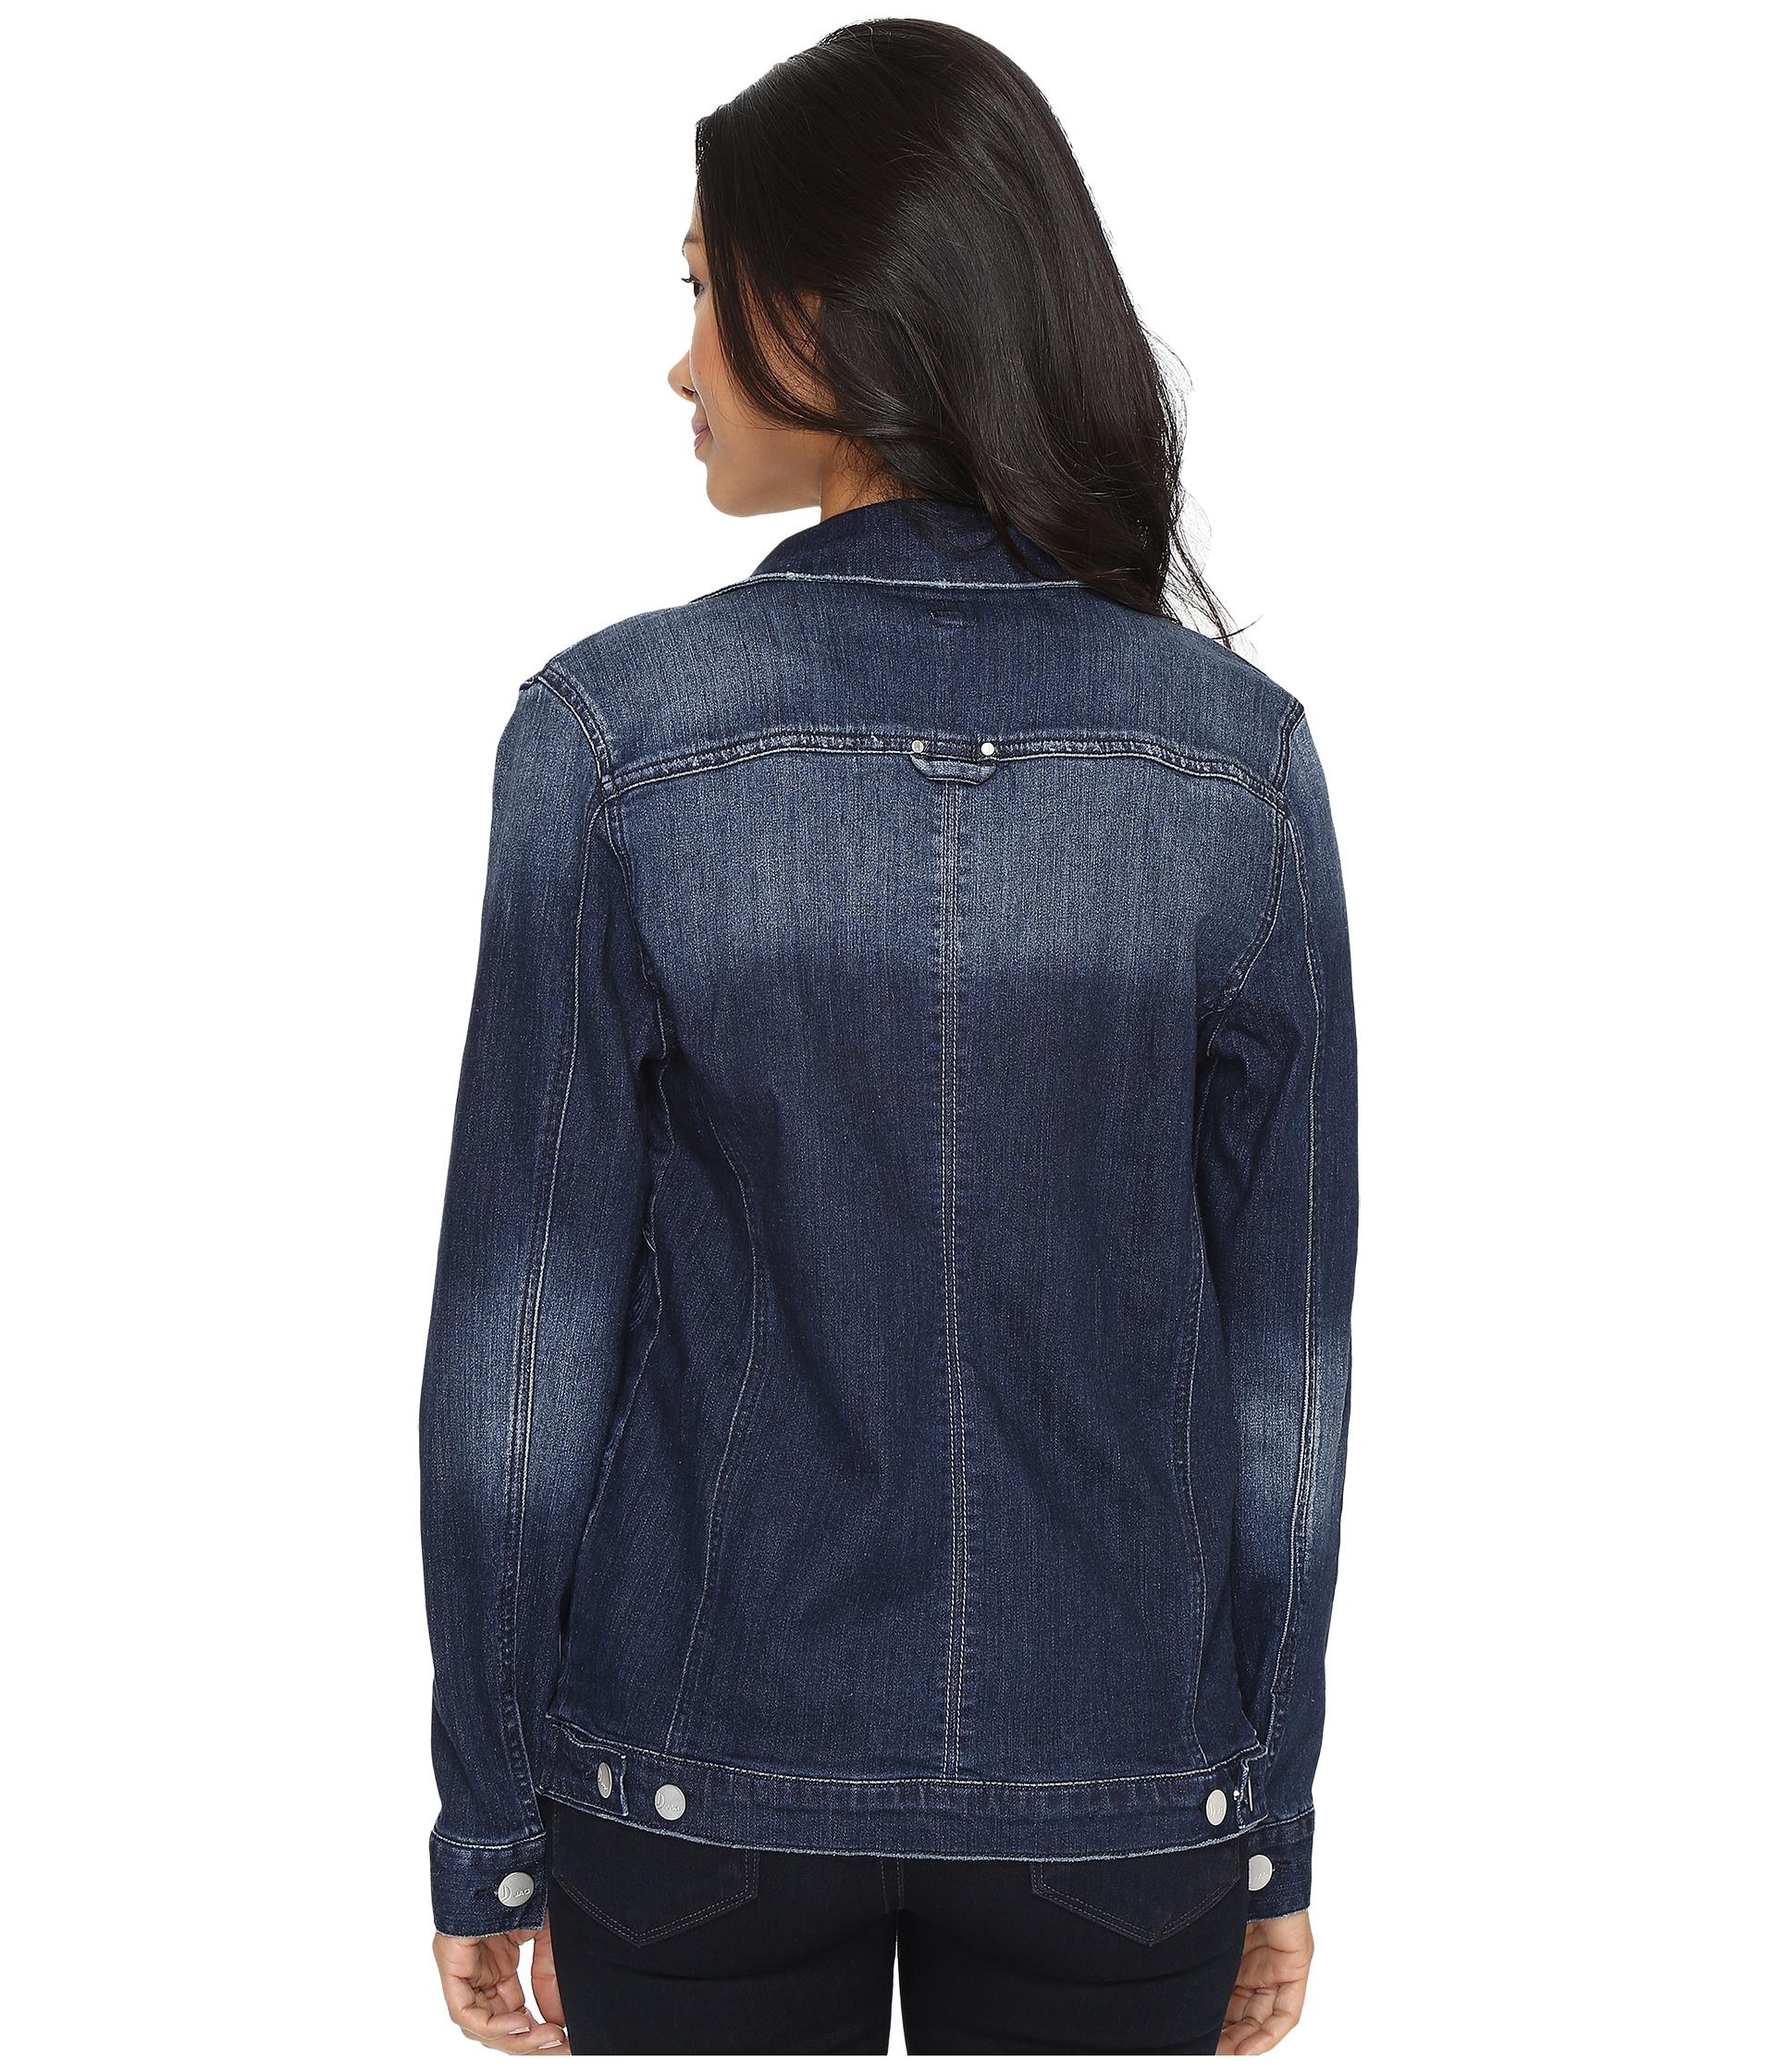 Jag Jeans Lowen Laser Mission Denim Jacket In Rapid Dark - Zappos.com Free Shipping BOTH Ways